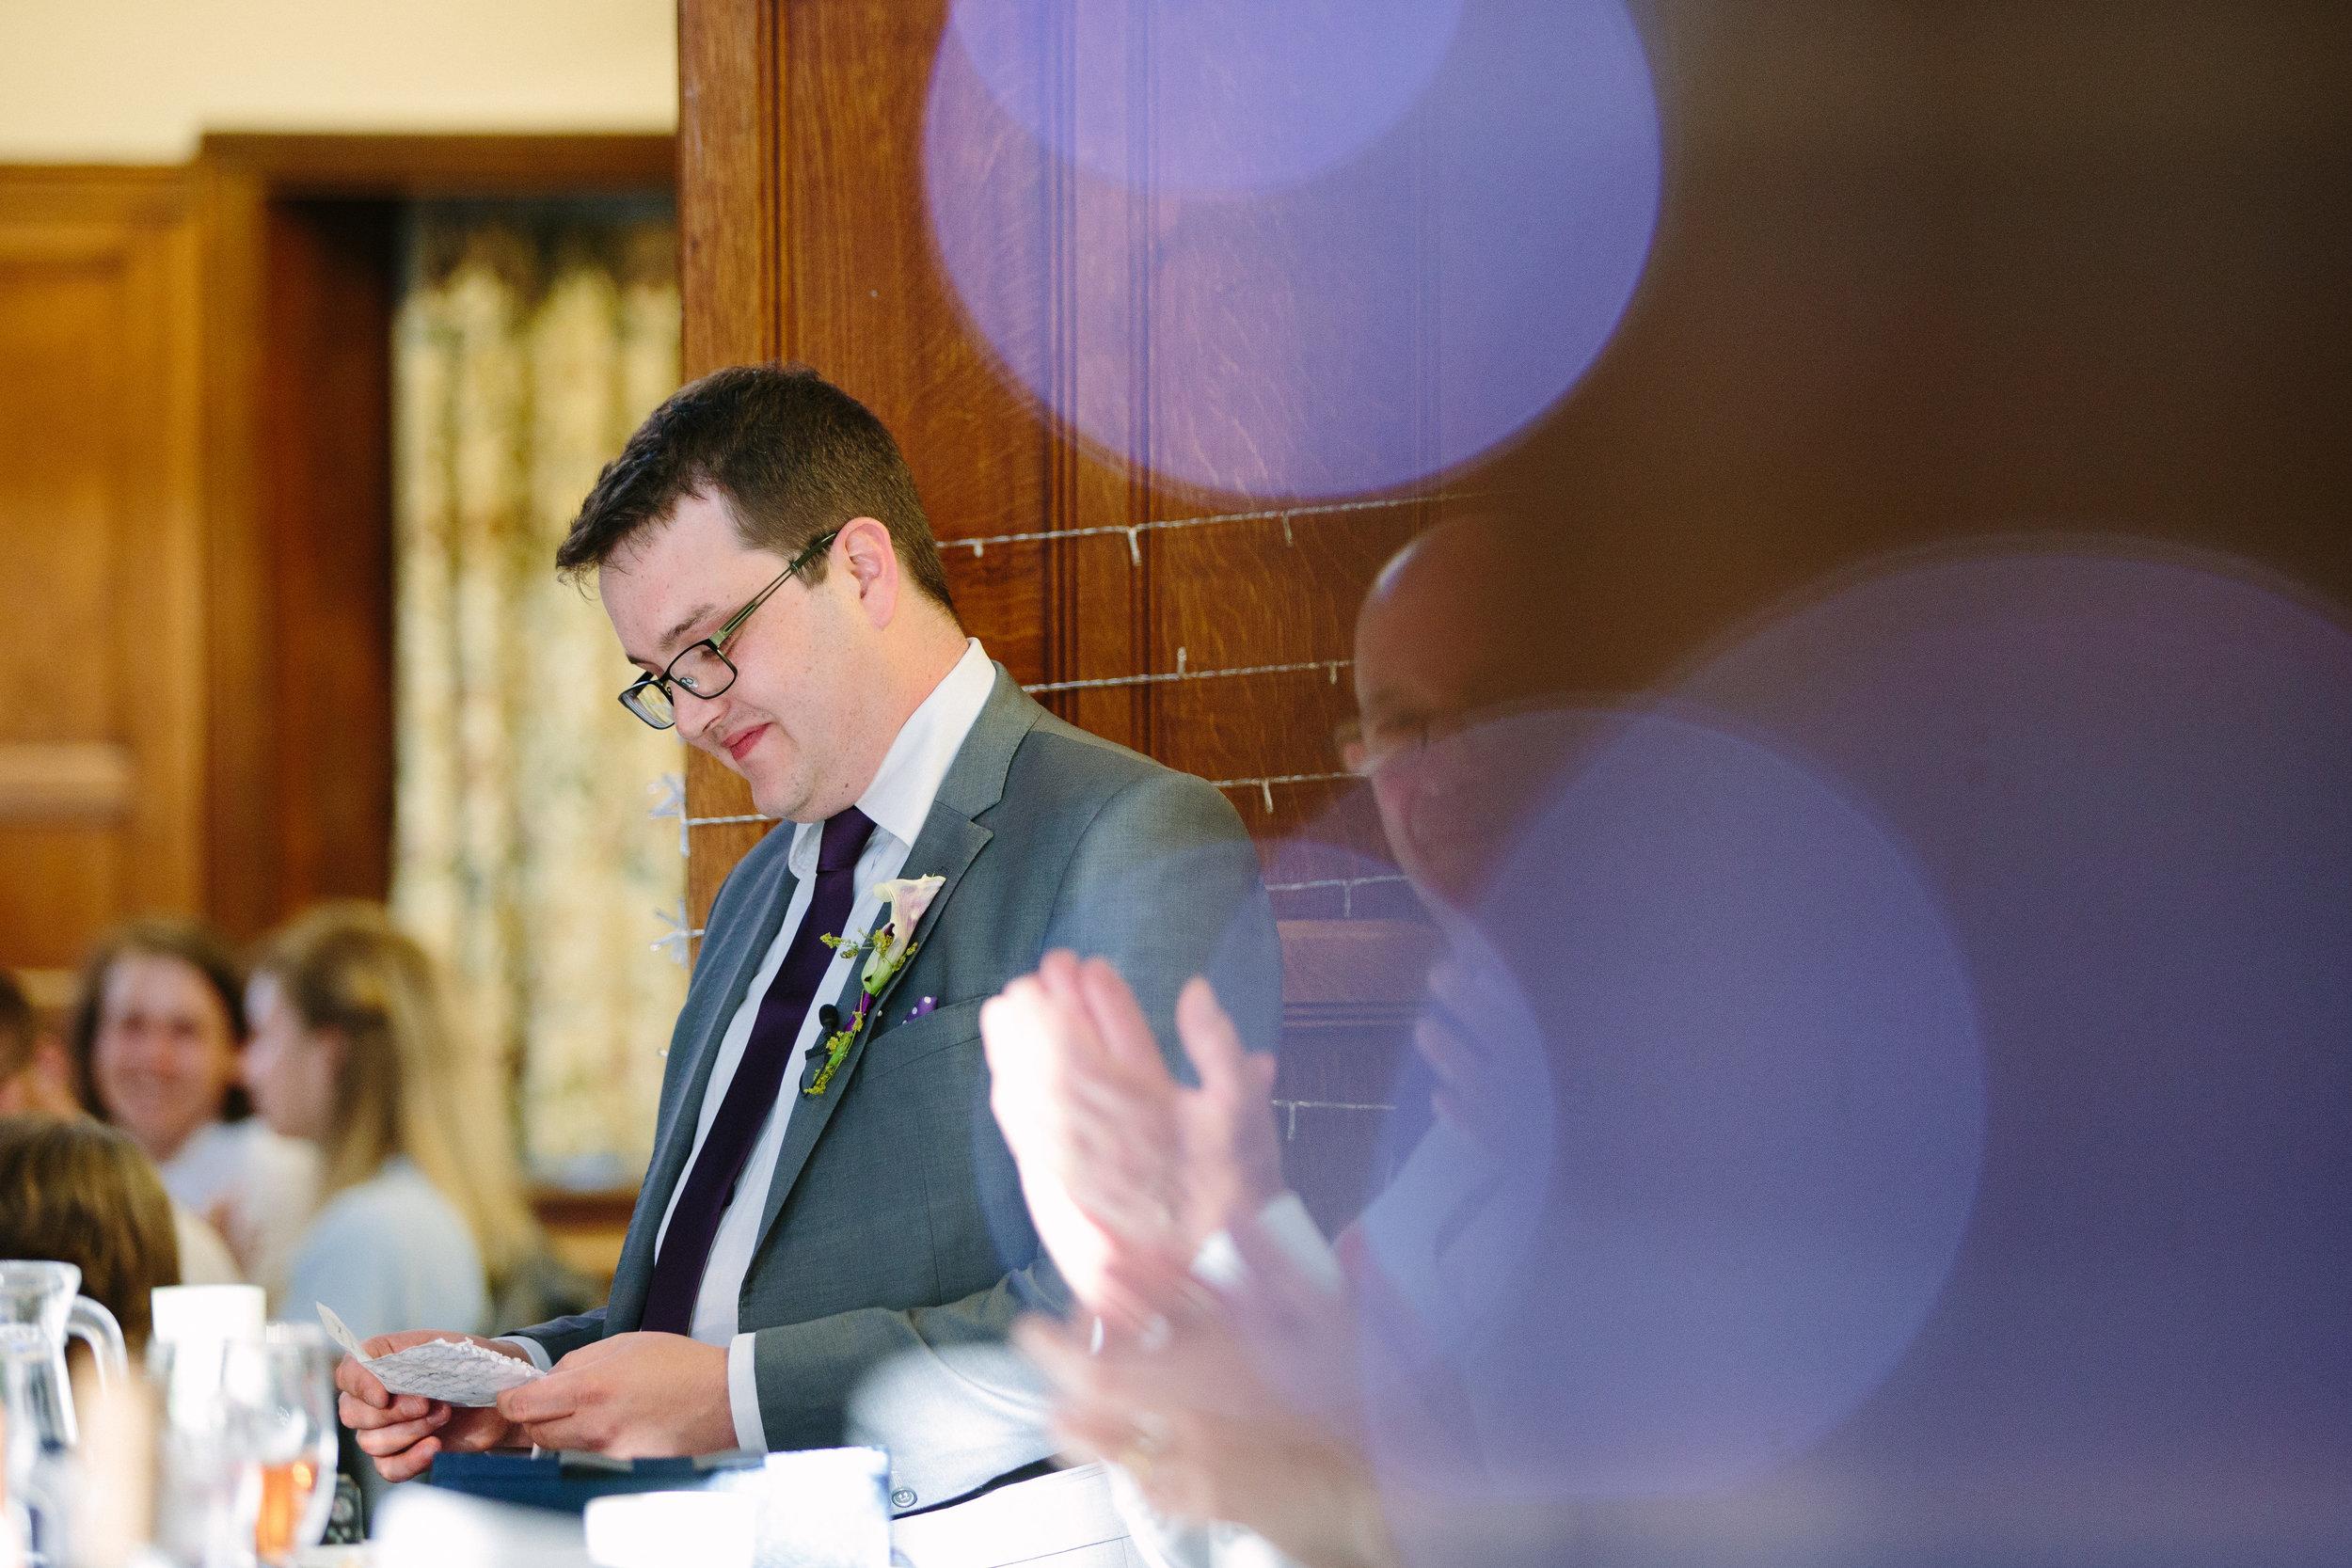 Saint-Alfege-Church-greenwich-wedding-charlton-house-speech-389